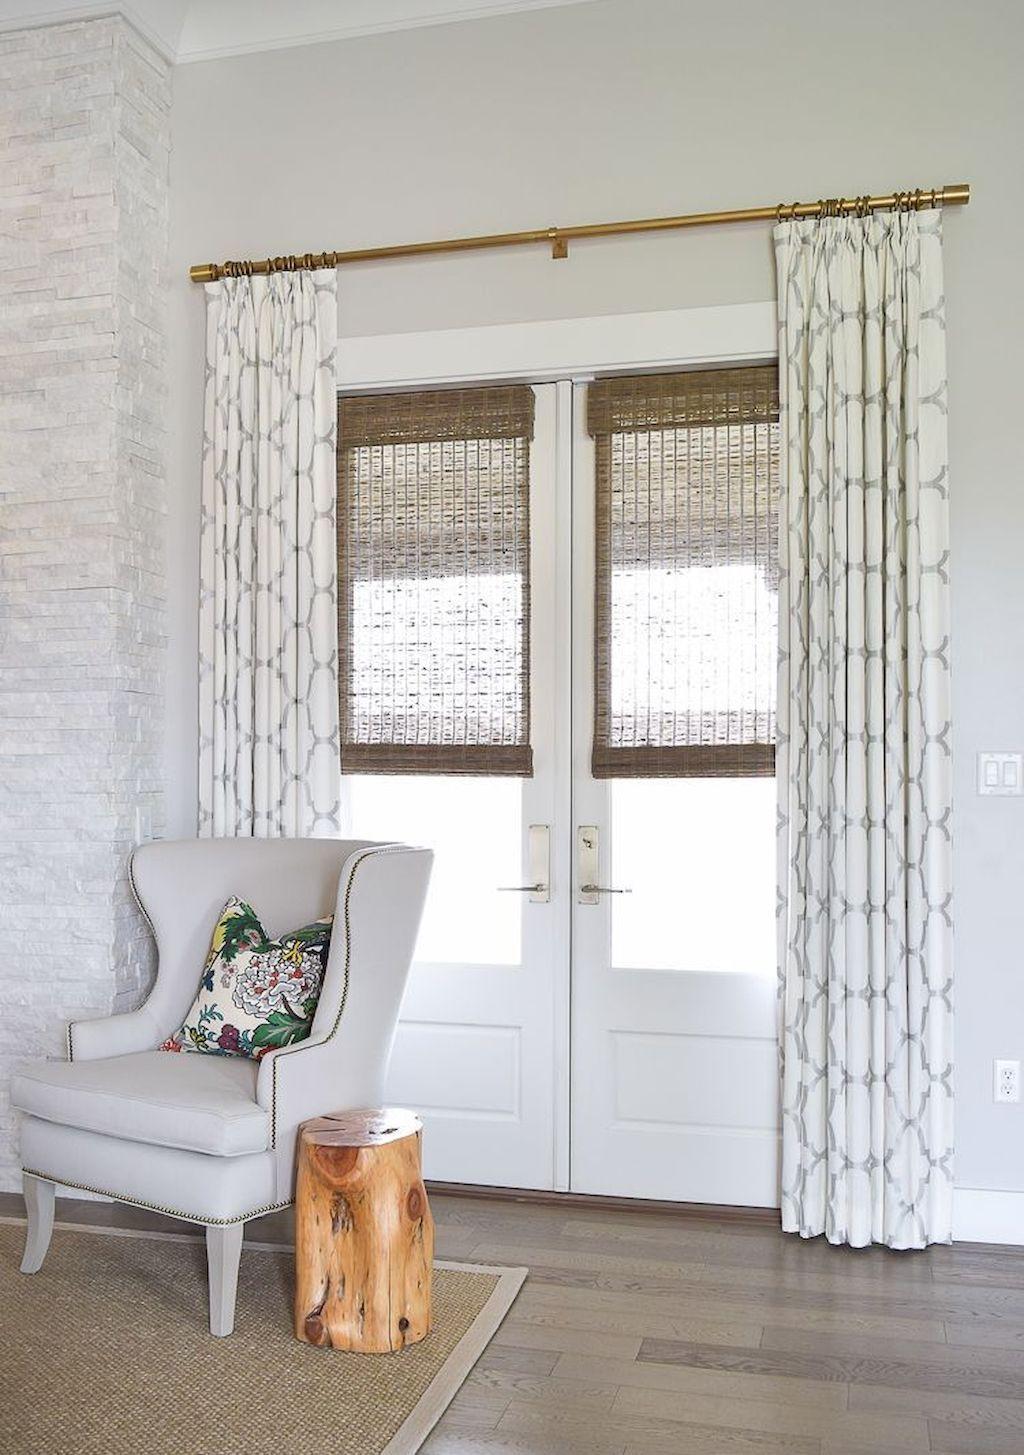 73 Modern Farmhouse Curtains for Living Room Decorating ... on Farmhouse Living Room Curtain Ideas  id=74441